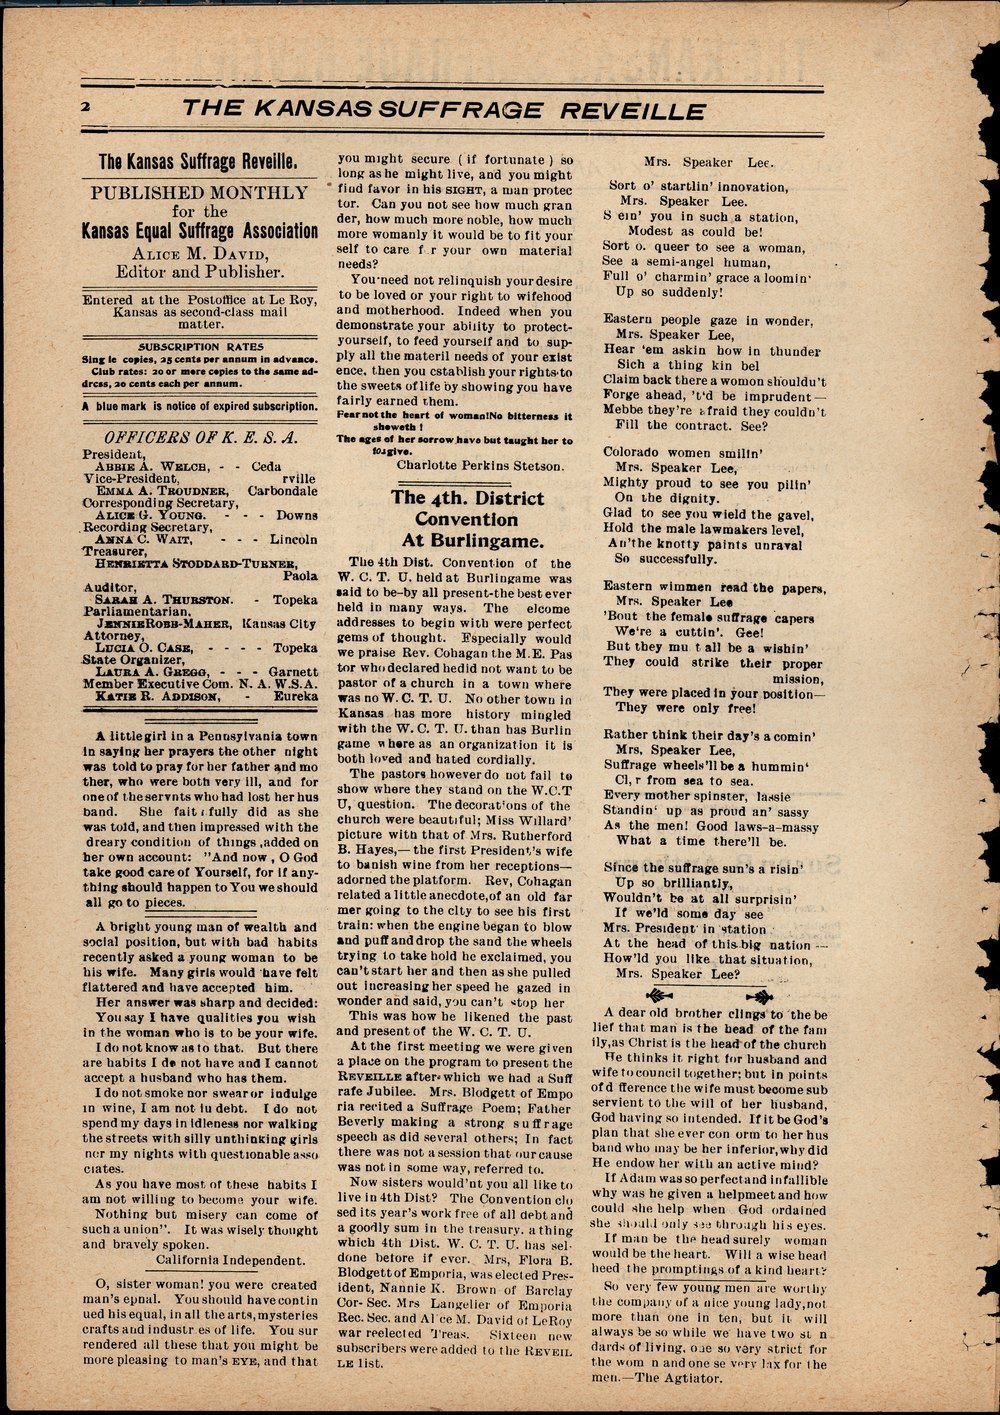 Kansas Suffrage Reveille: organ of the Kansas Equal Suffrage Association - 2